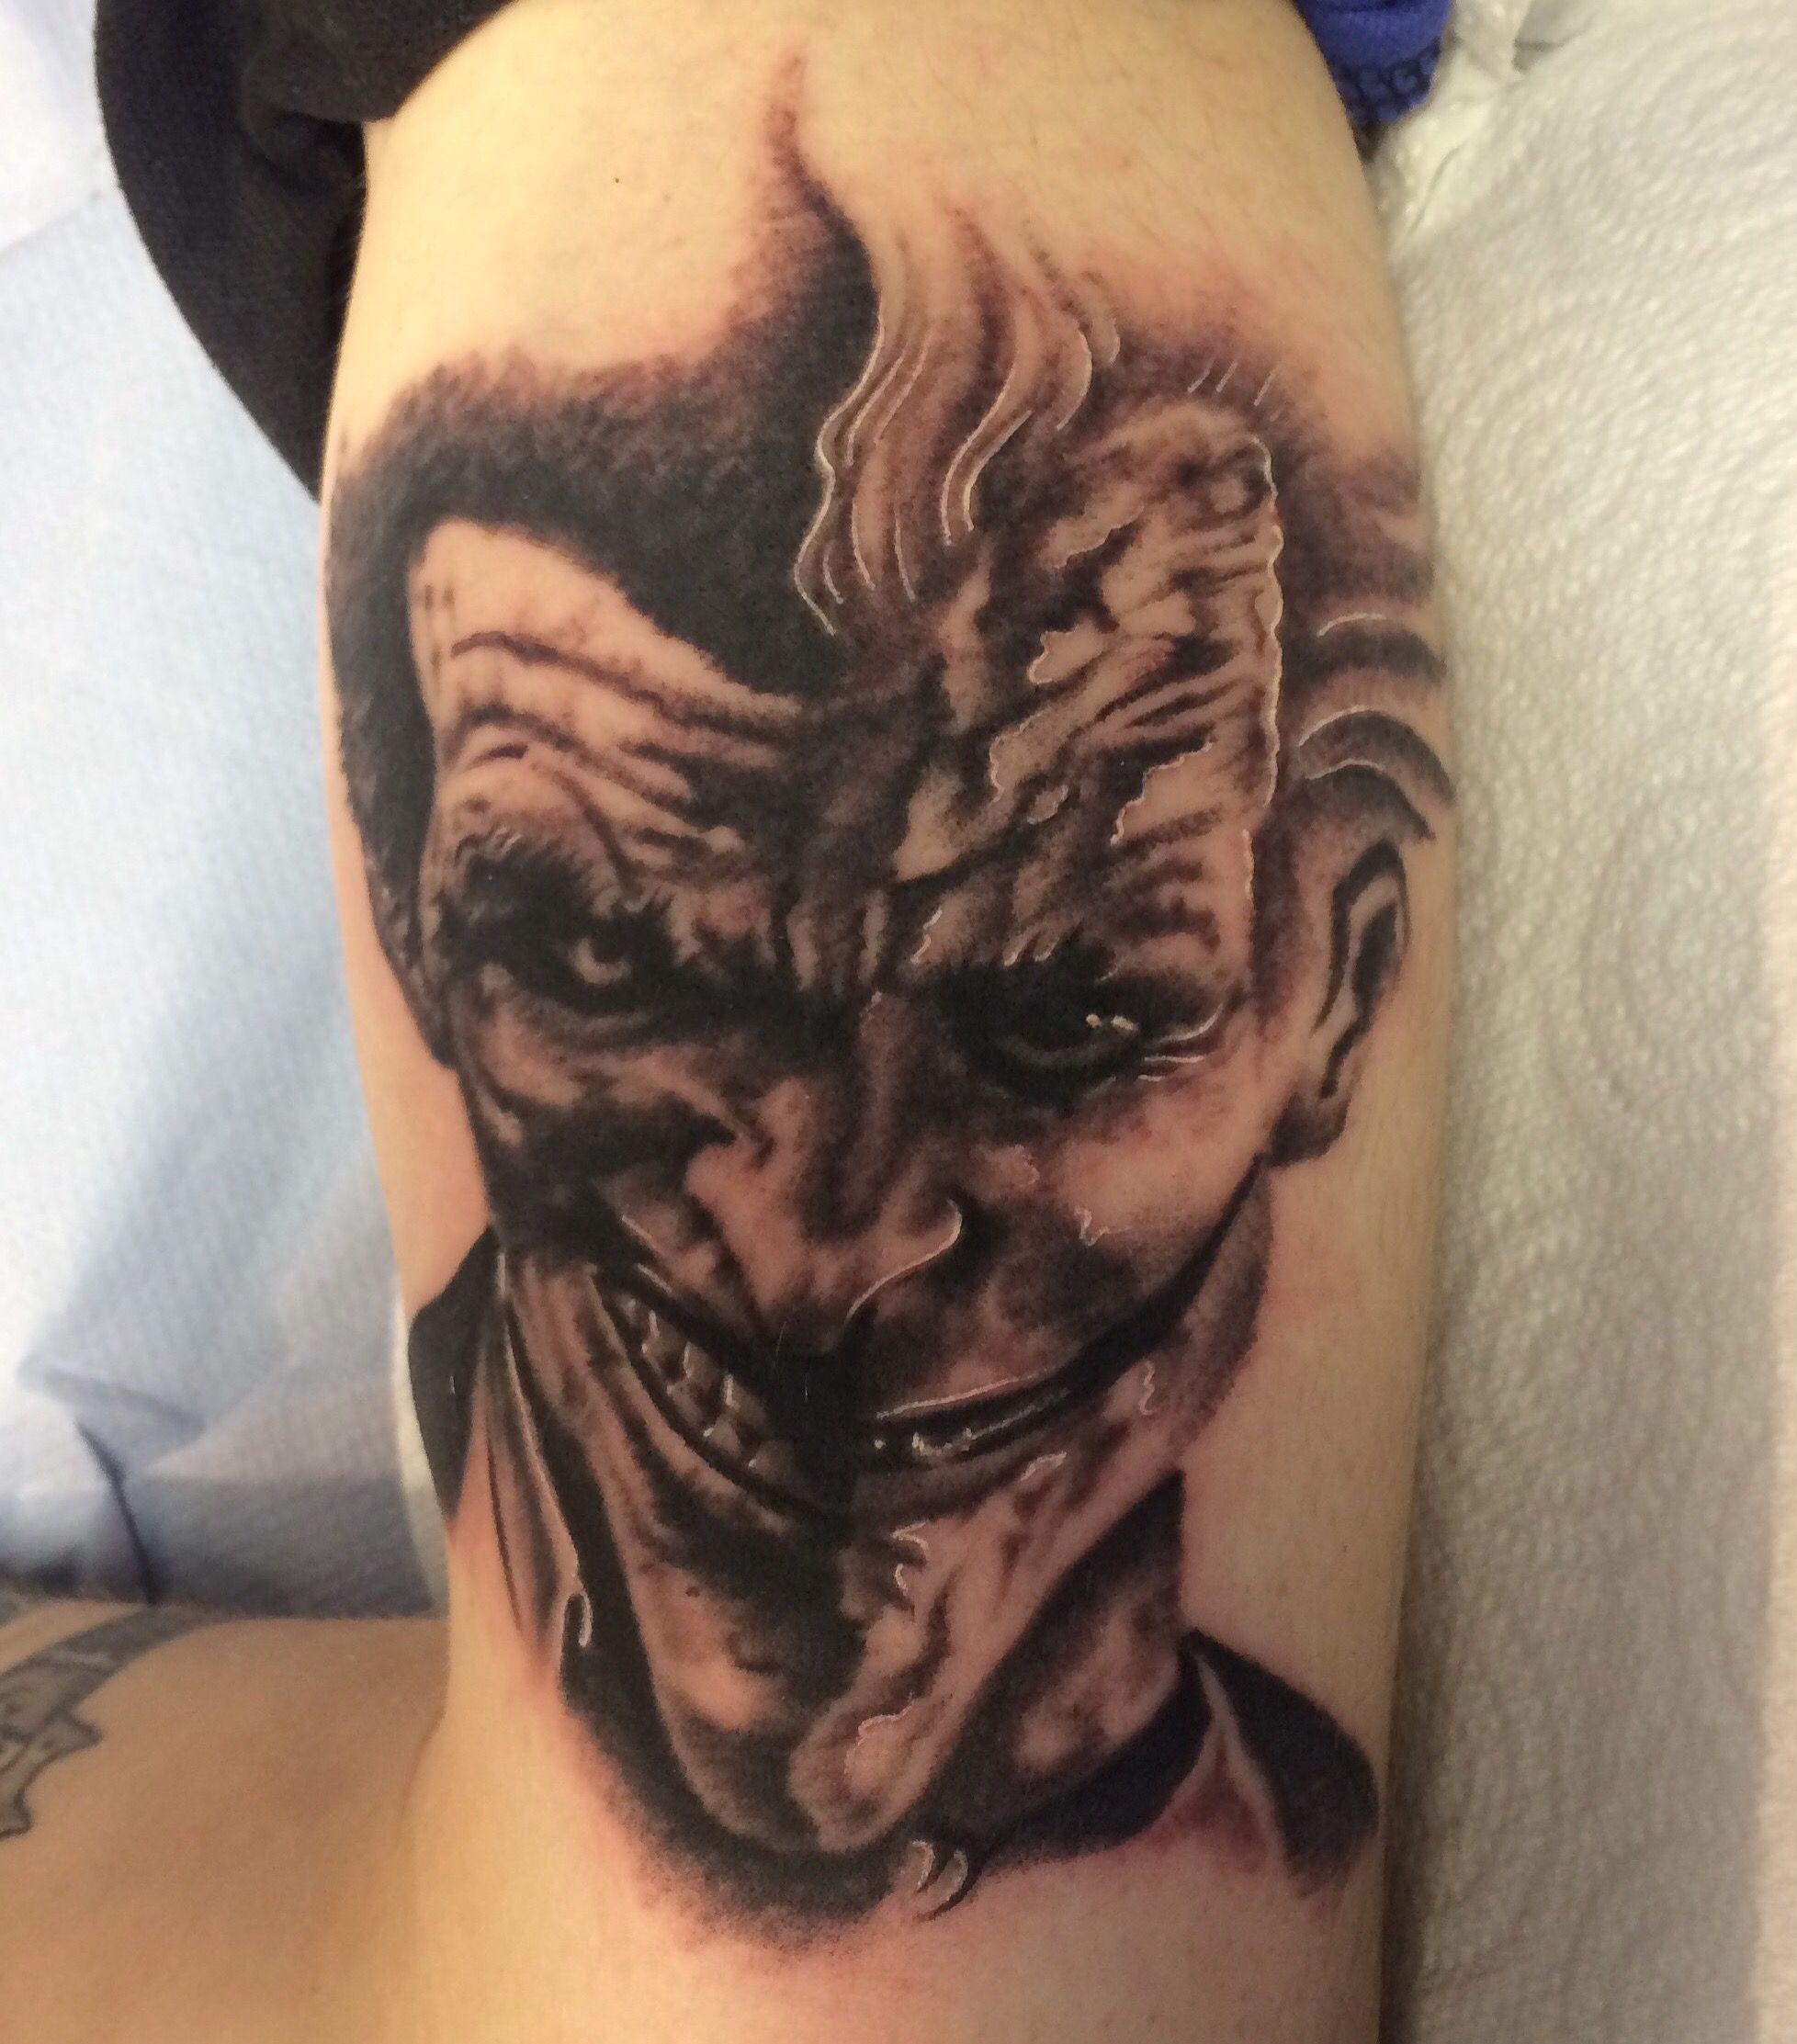 2539f8e46 Joker realism tattoo done by Travis Allen at twisted tattoo Yaxley Www.  twistedtattoo.co